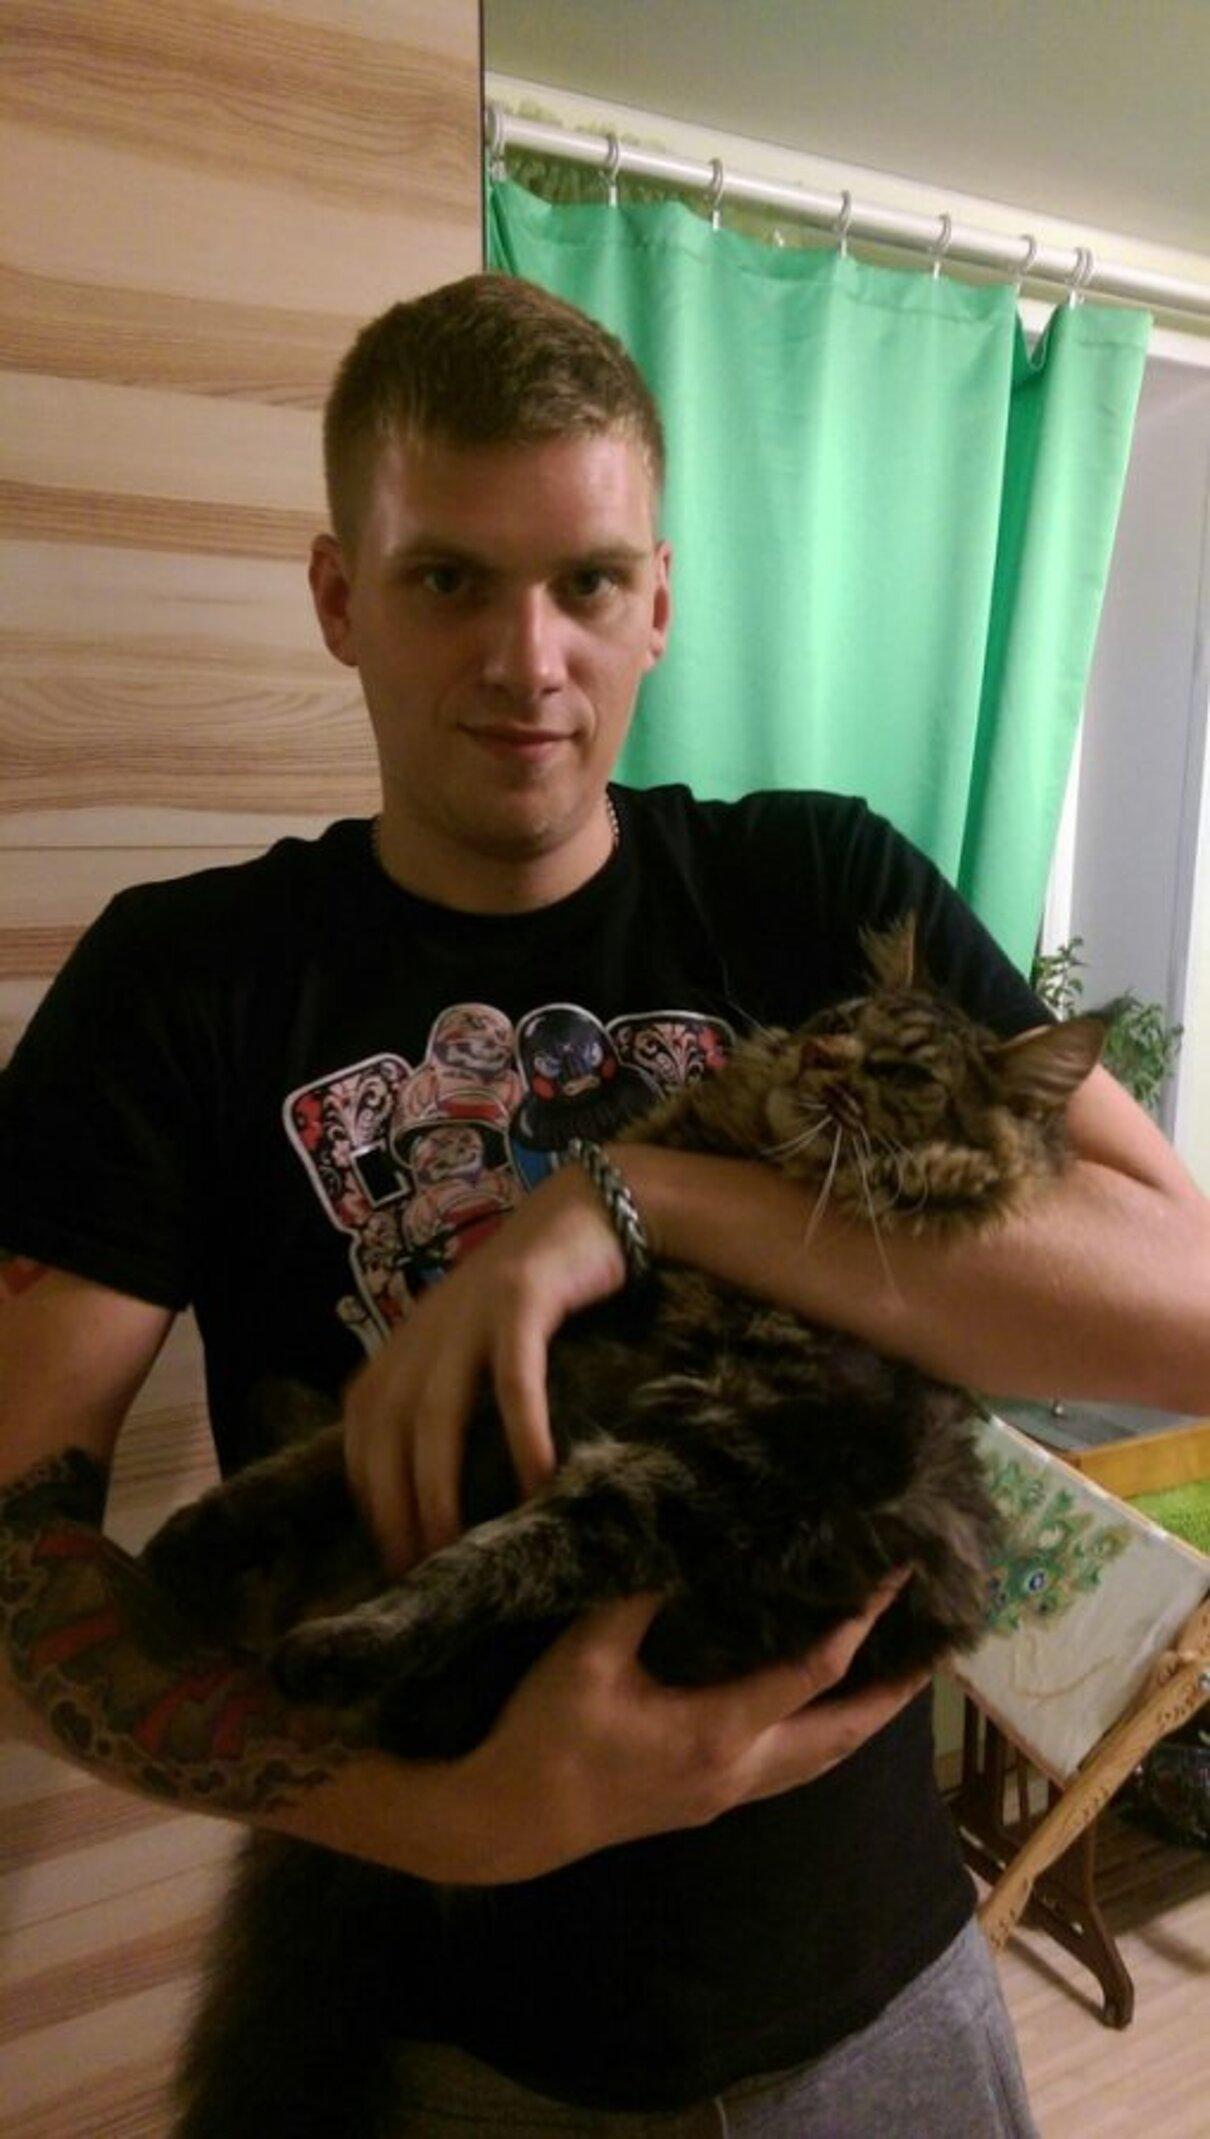 Жалоба-отзыв: Храмов Владимир Александрович - Мошенник с сайта знакомств.  Фото №1